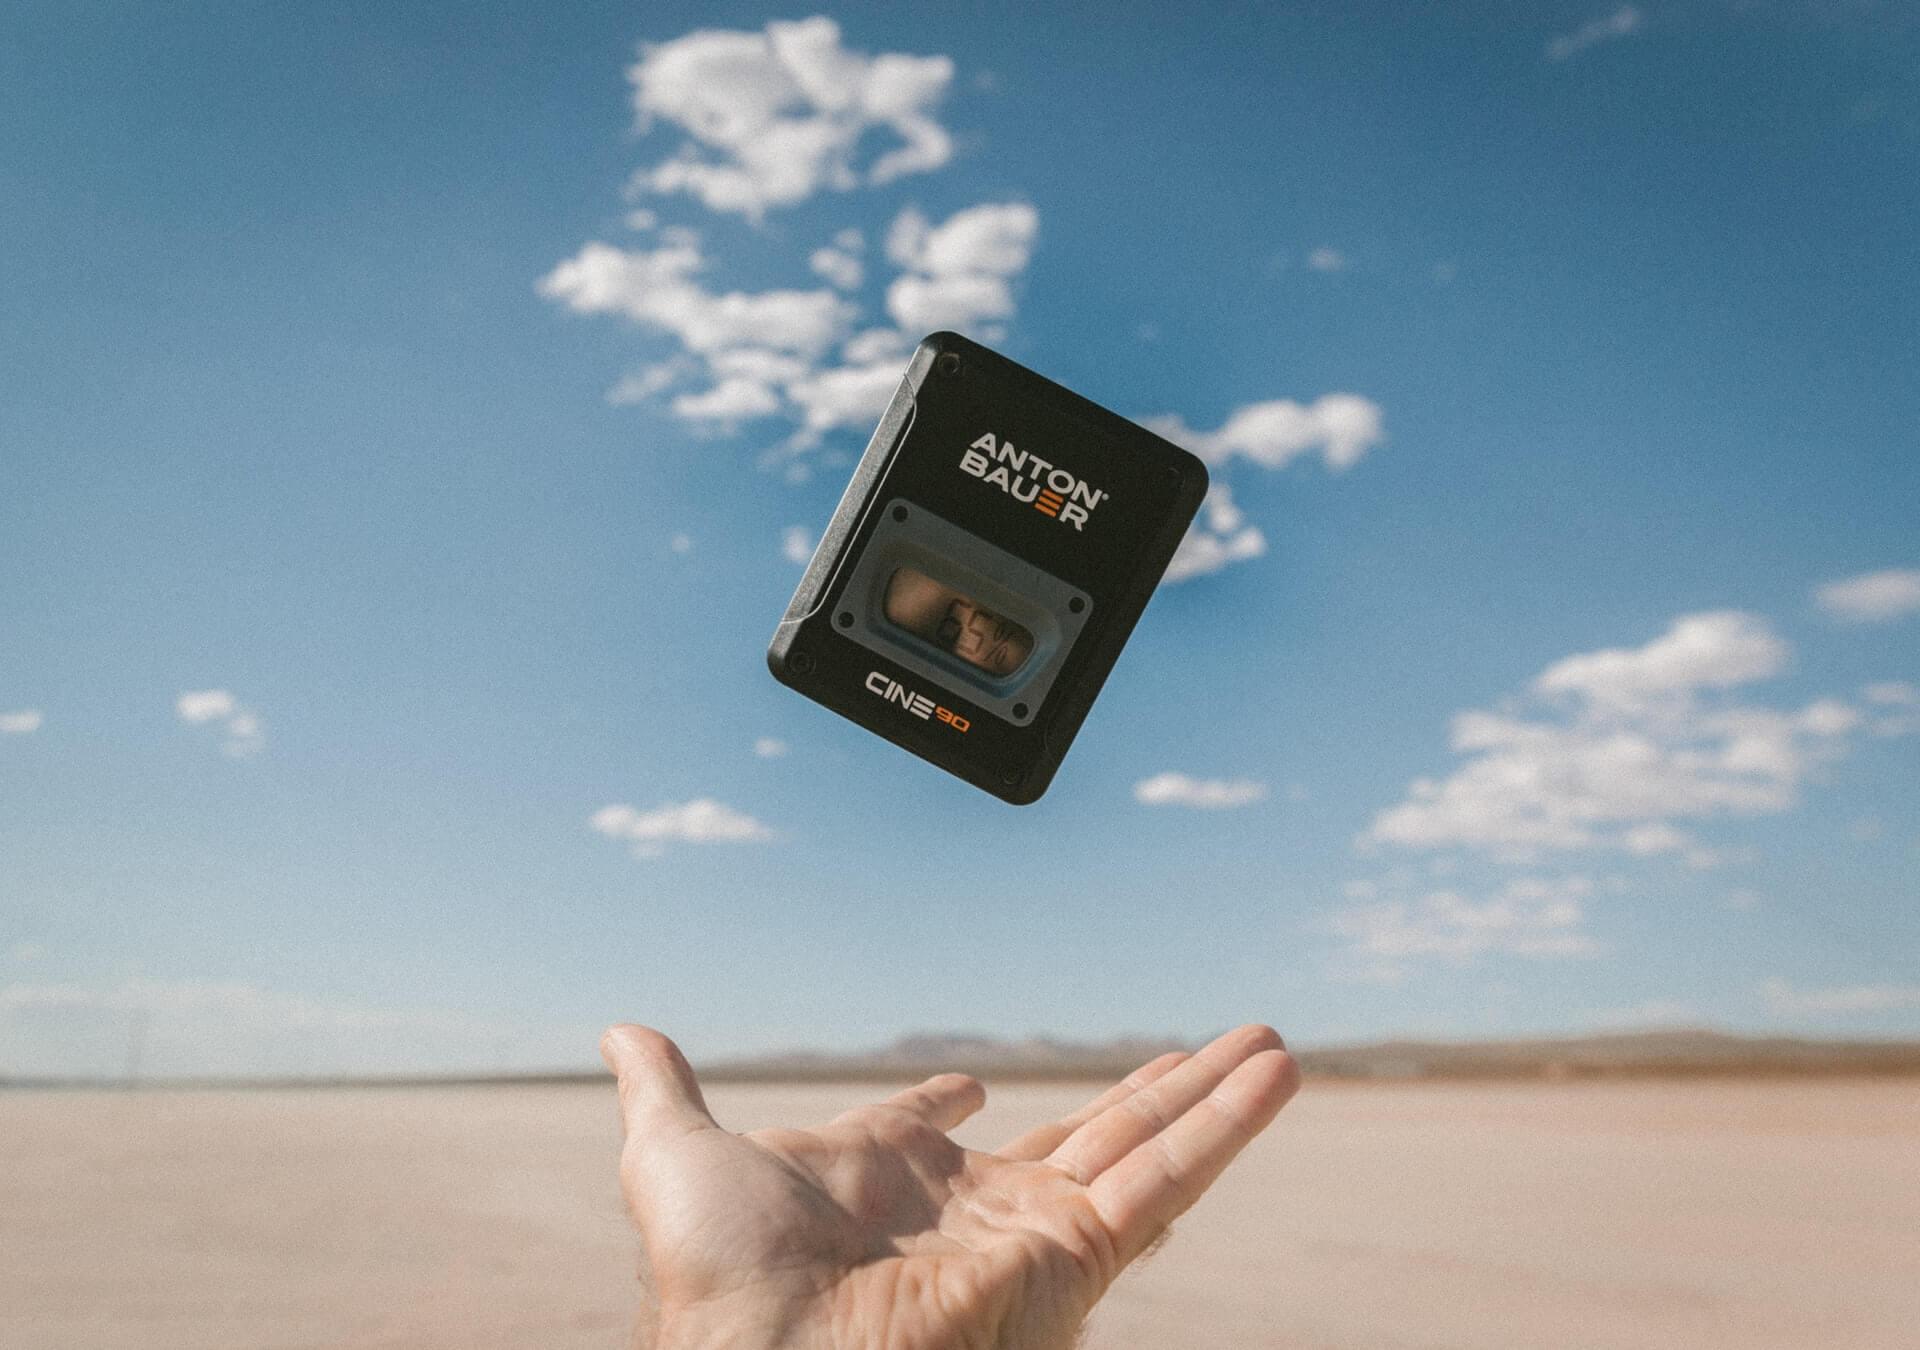 Anton Bauer Device on the Beach